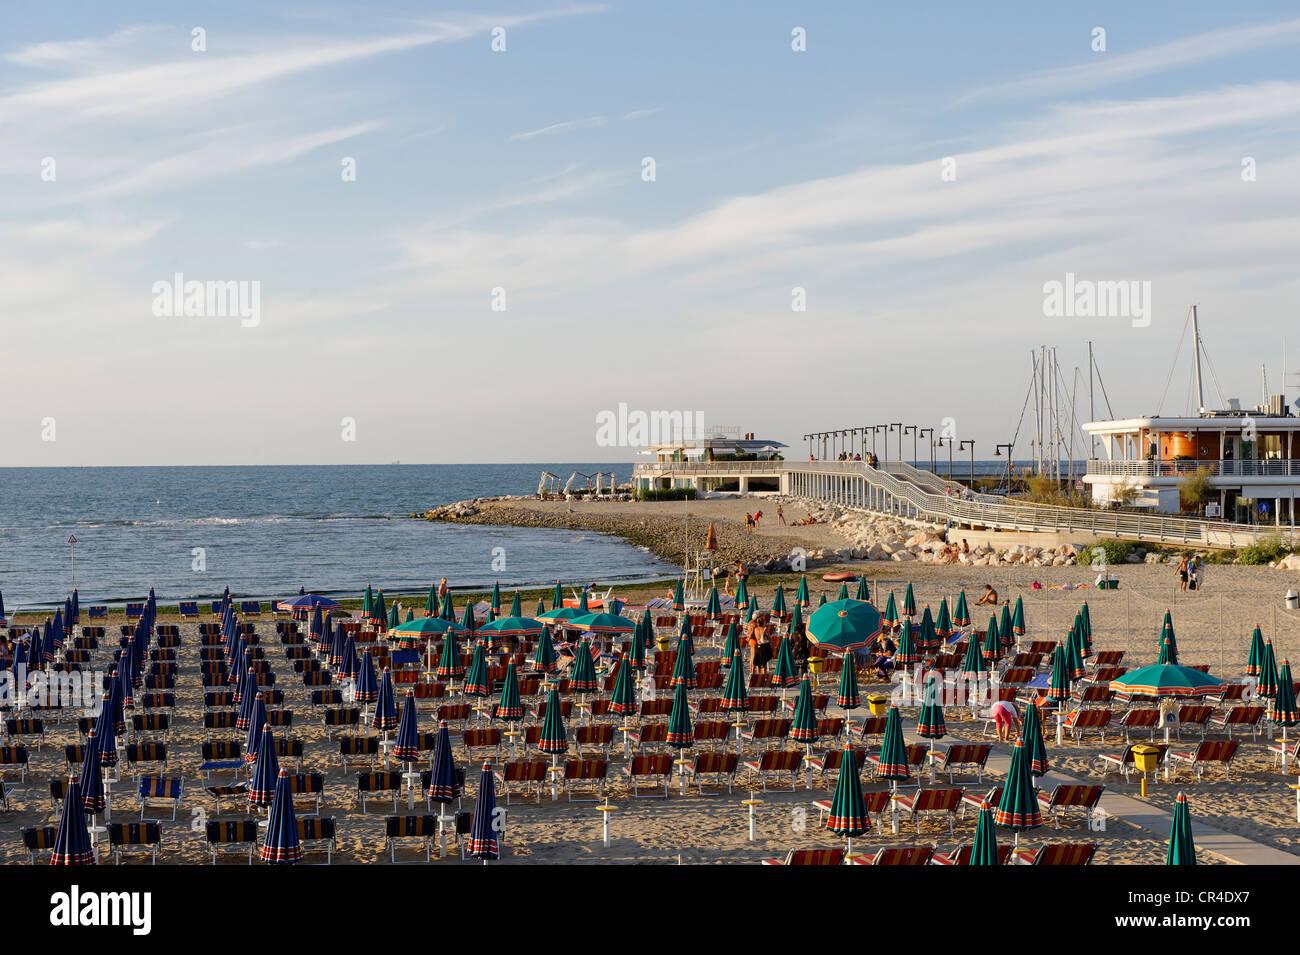 Cattolica, Province Rimini, Emilia-Romagna, Adriatic coast, Italy, Europe - Stock Image